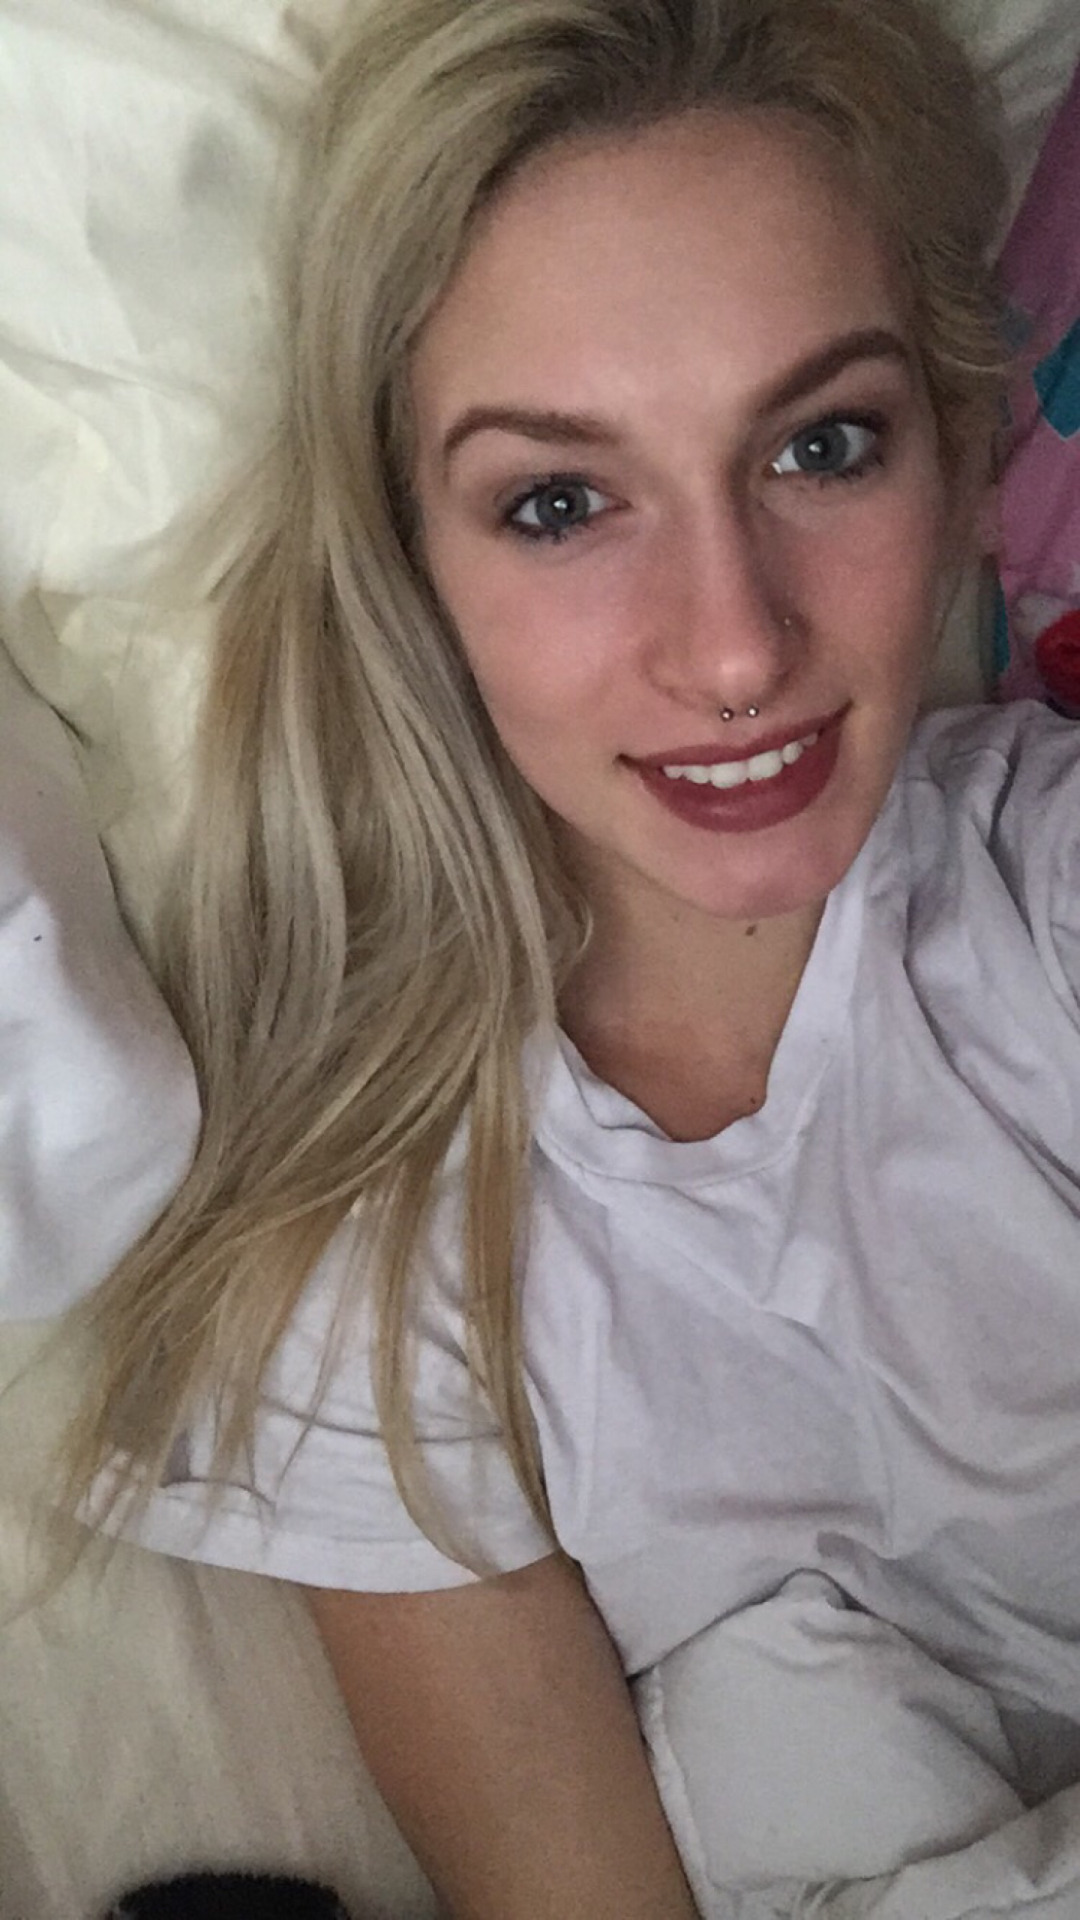 selfie coquin de fille sexy du 36 en manque